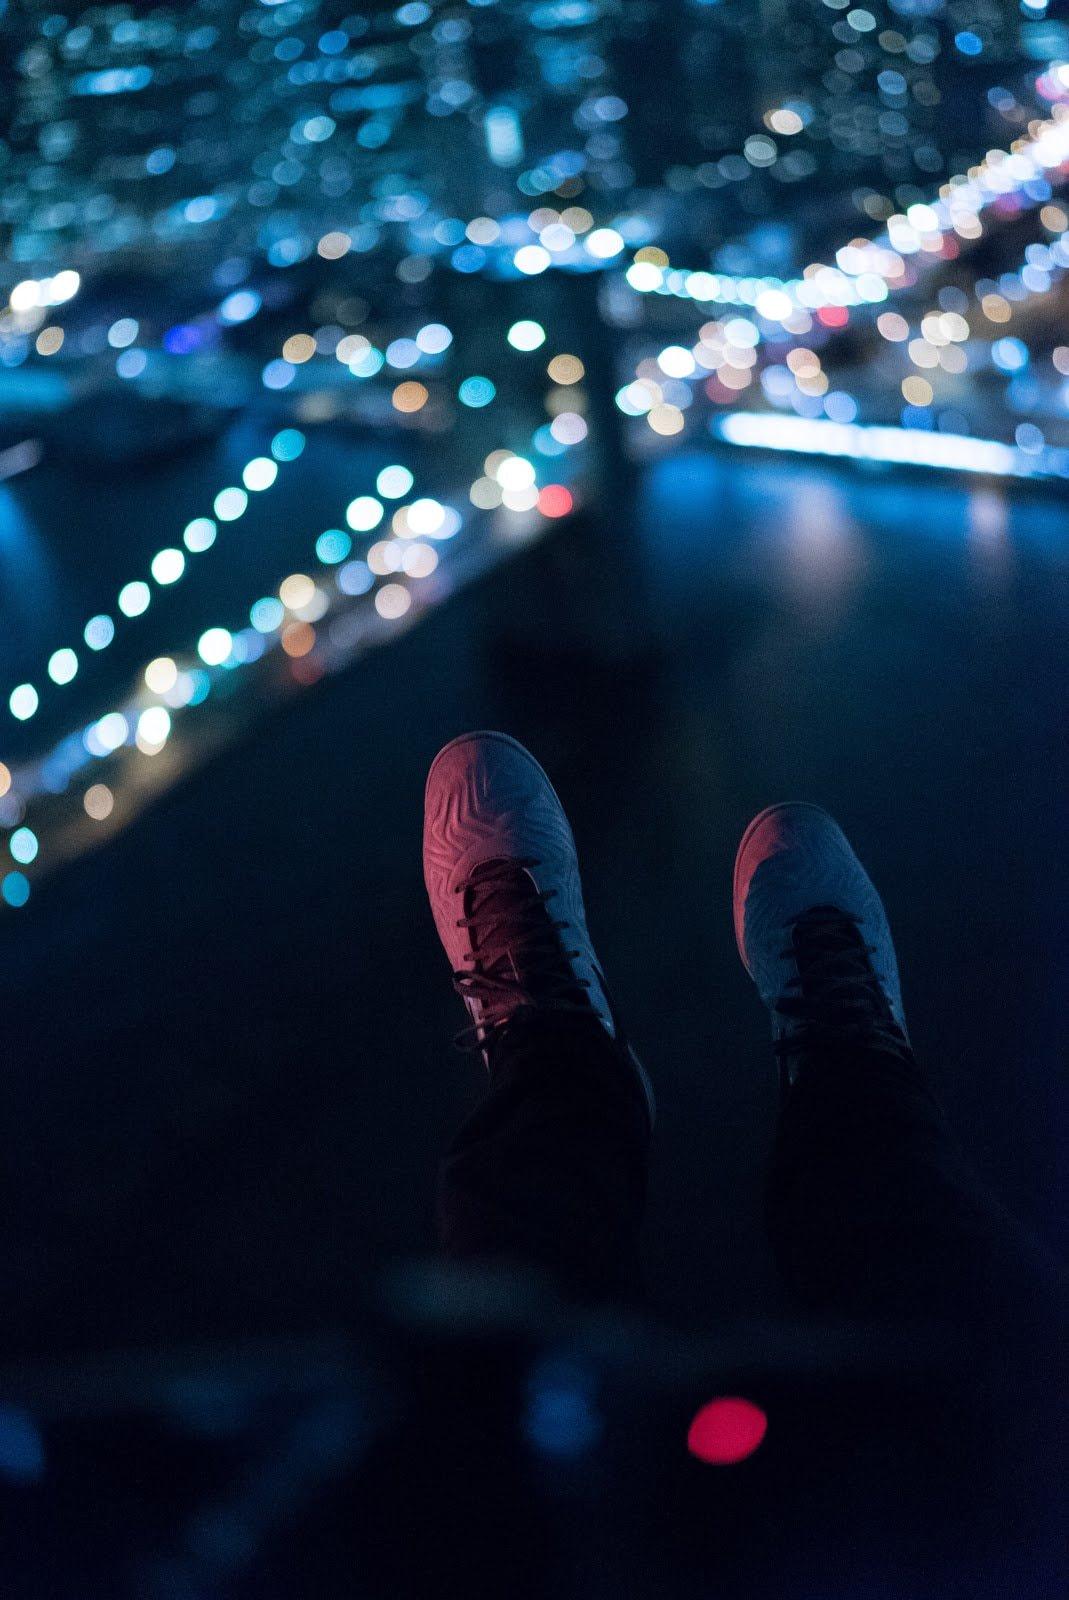 City lights bokeh as an example of depth of field photography by Matt Nelson